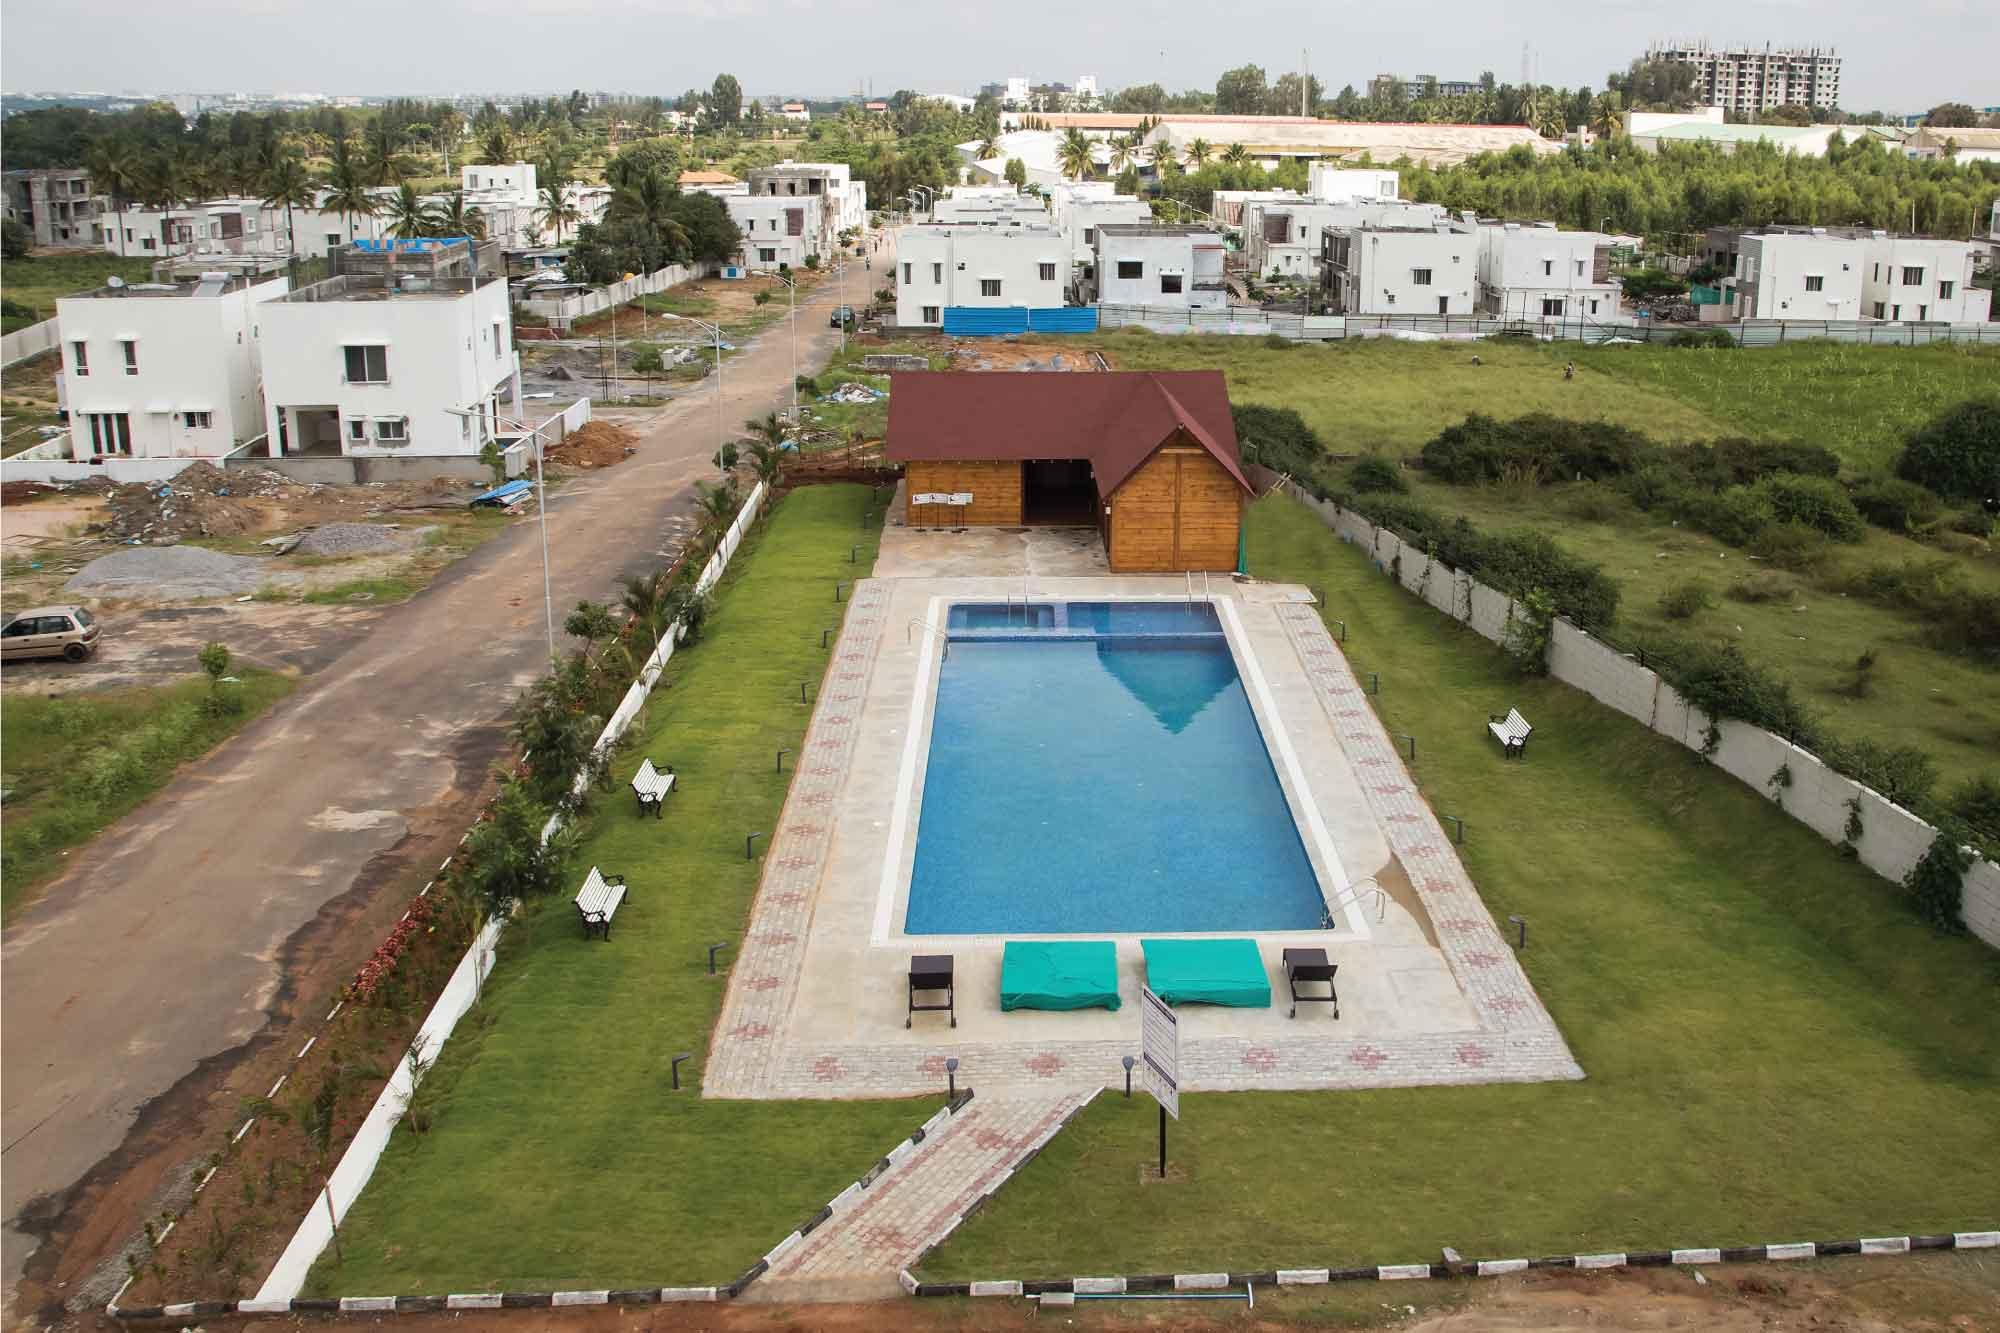 Artha Reviera Villa Marsur Bangalore 10836